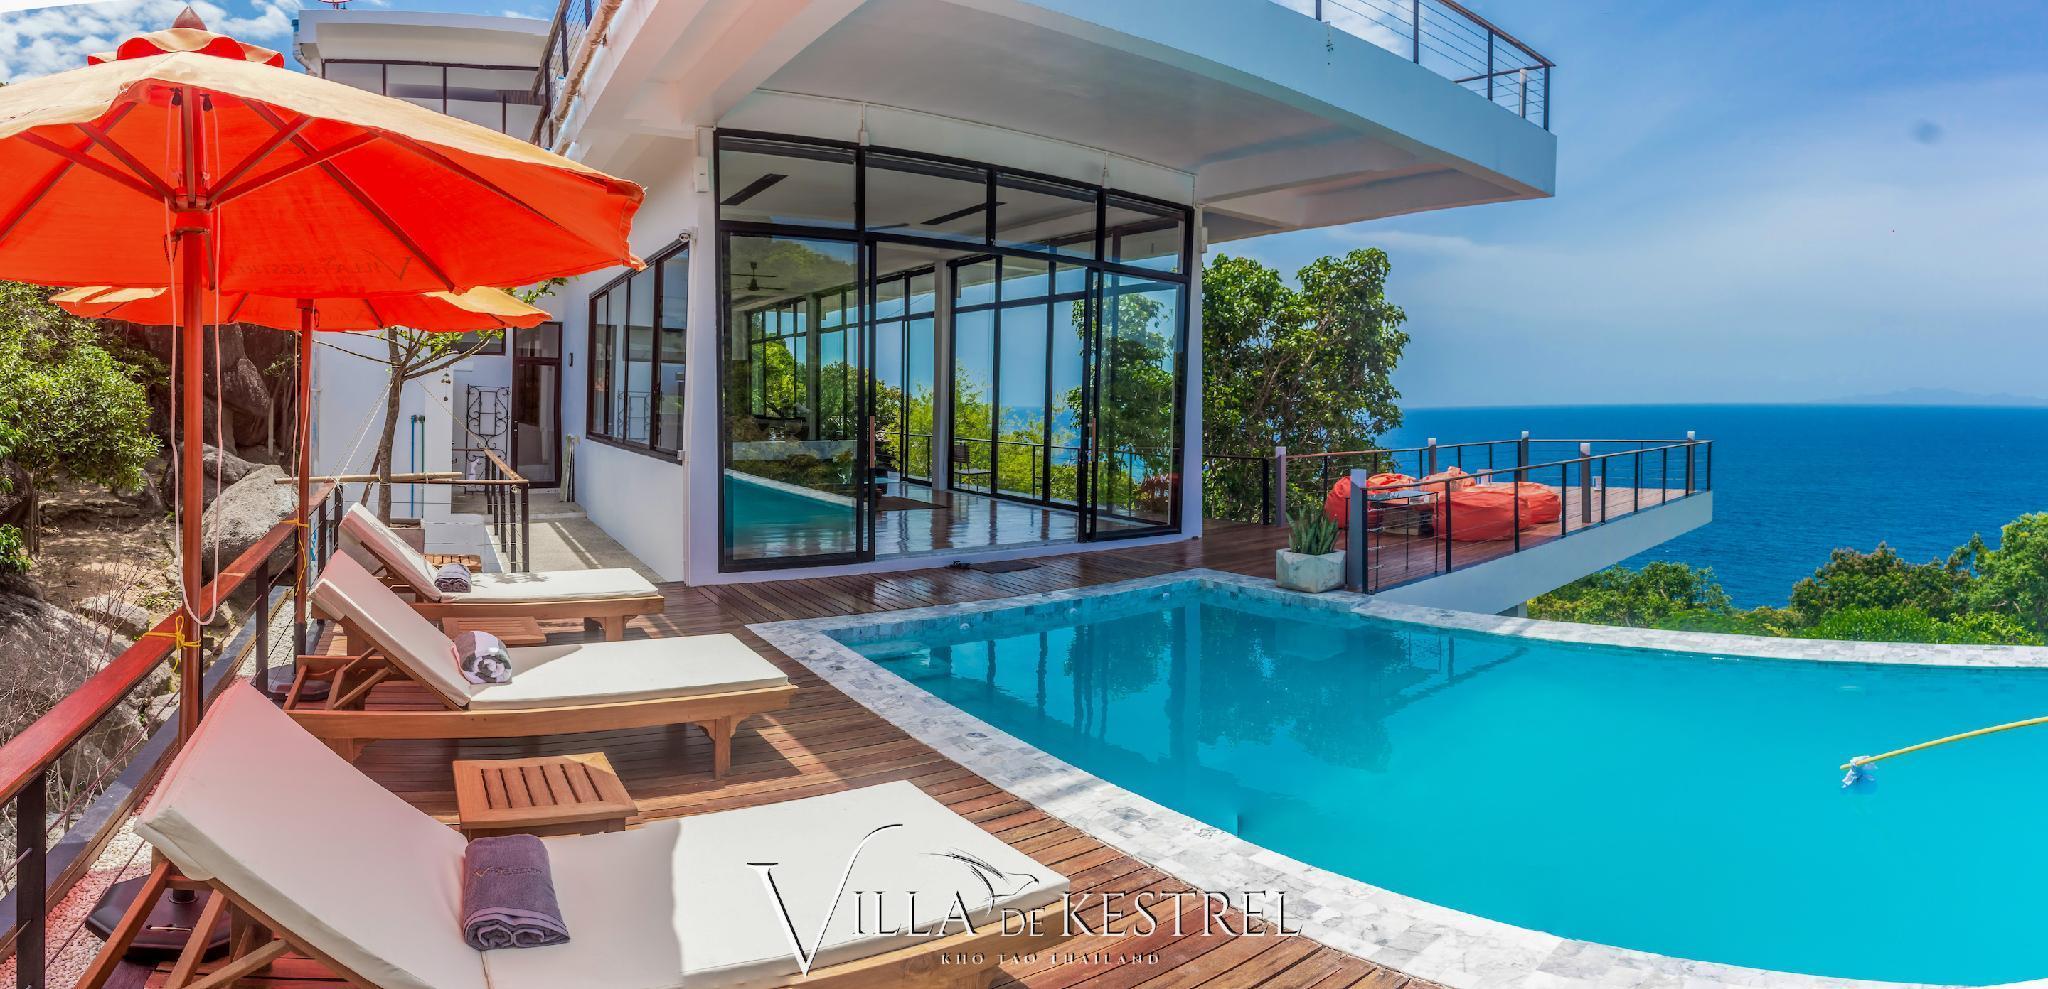 Villa De Kestrel 3 Bedrooms Villa De Kestrel 3 Bedrooms